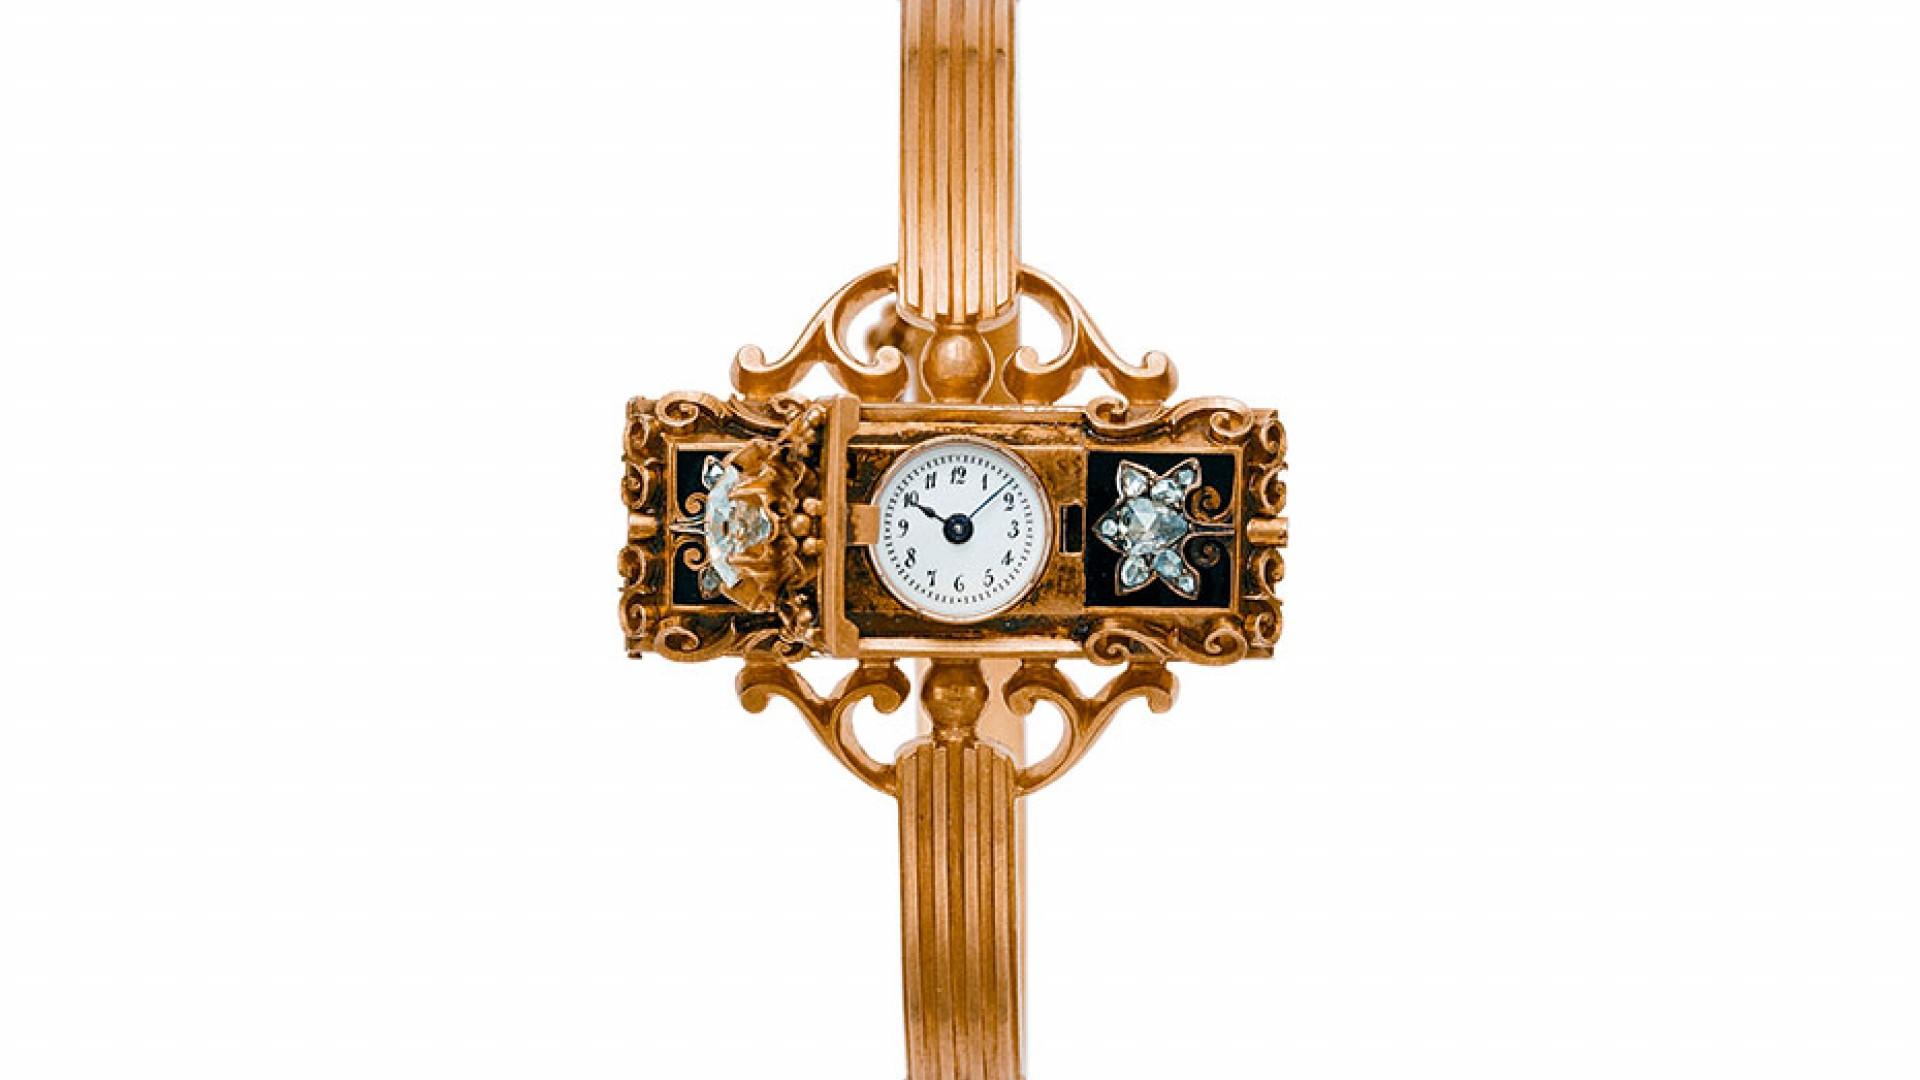 Patek Philippe wristwatch for Countess Koscowicz of Hungary